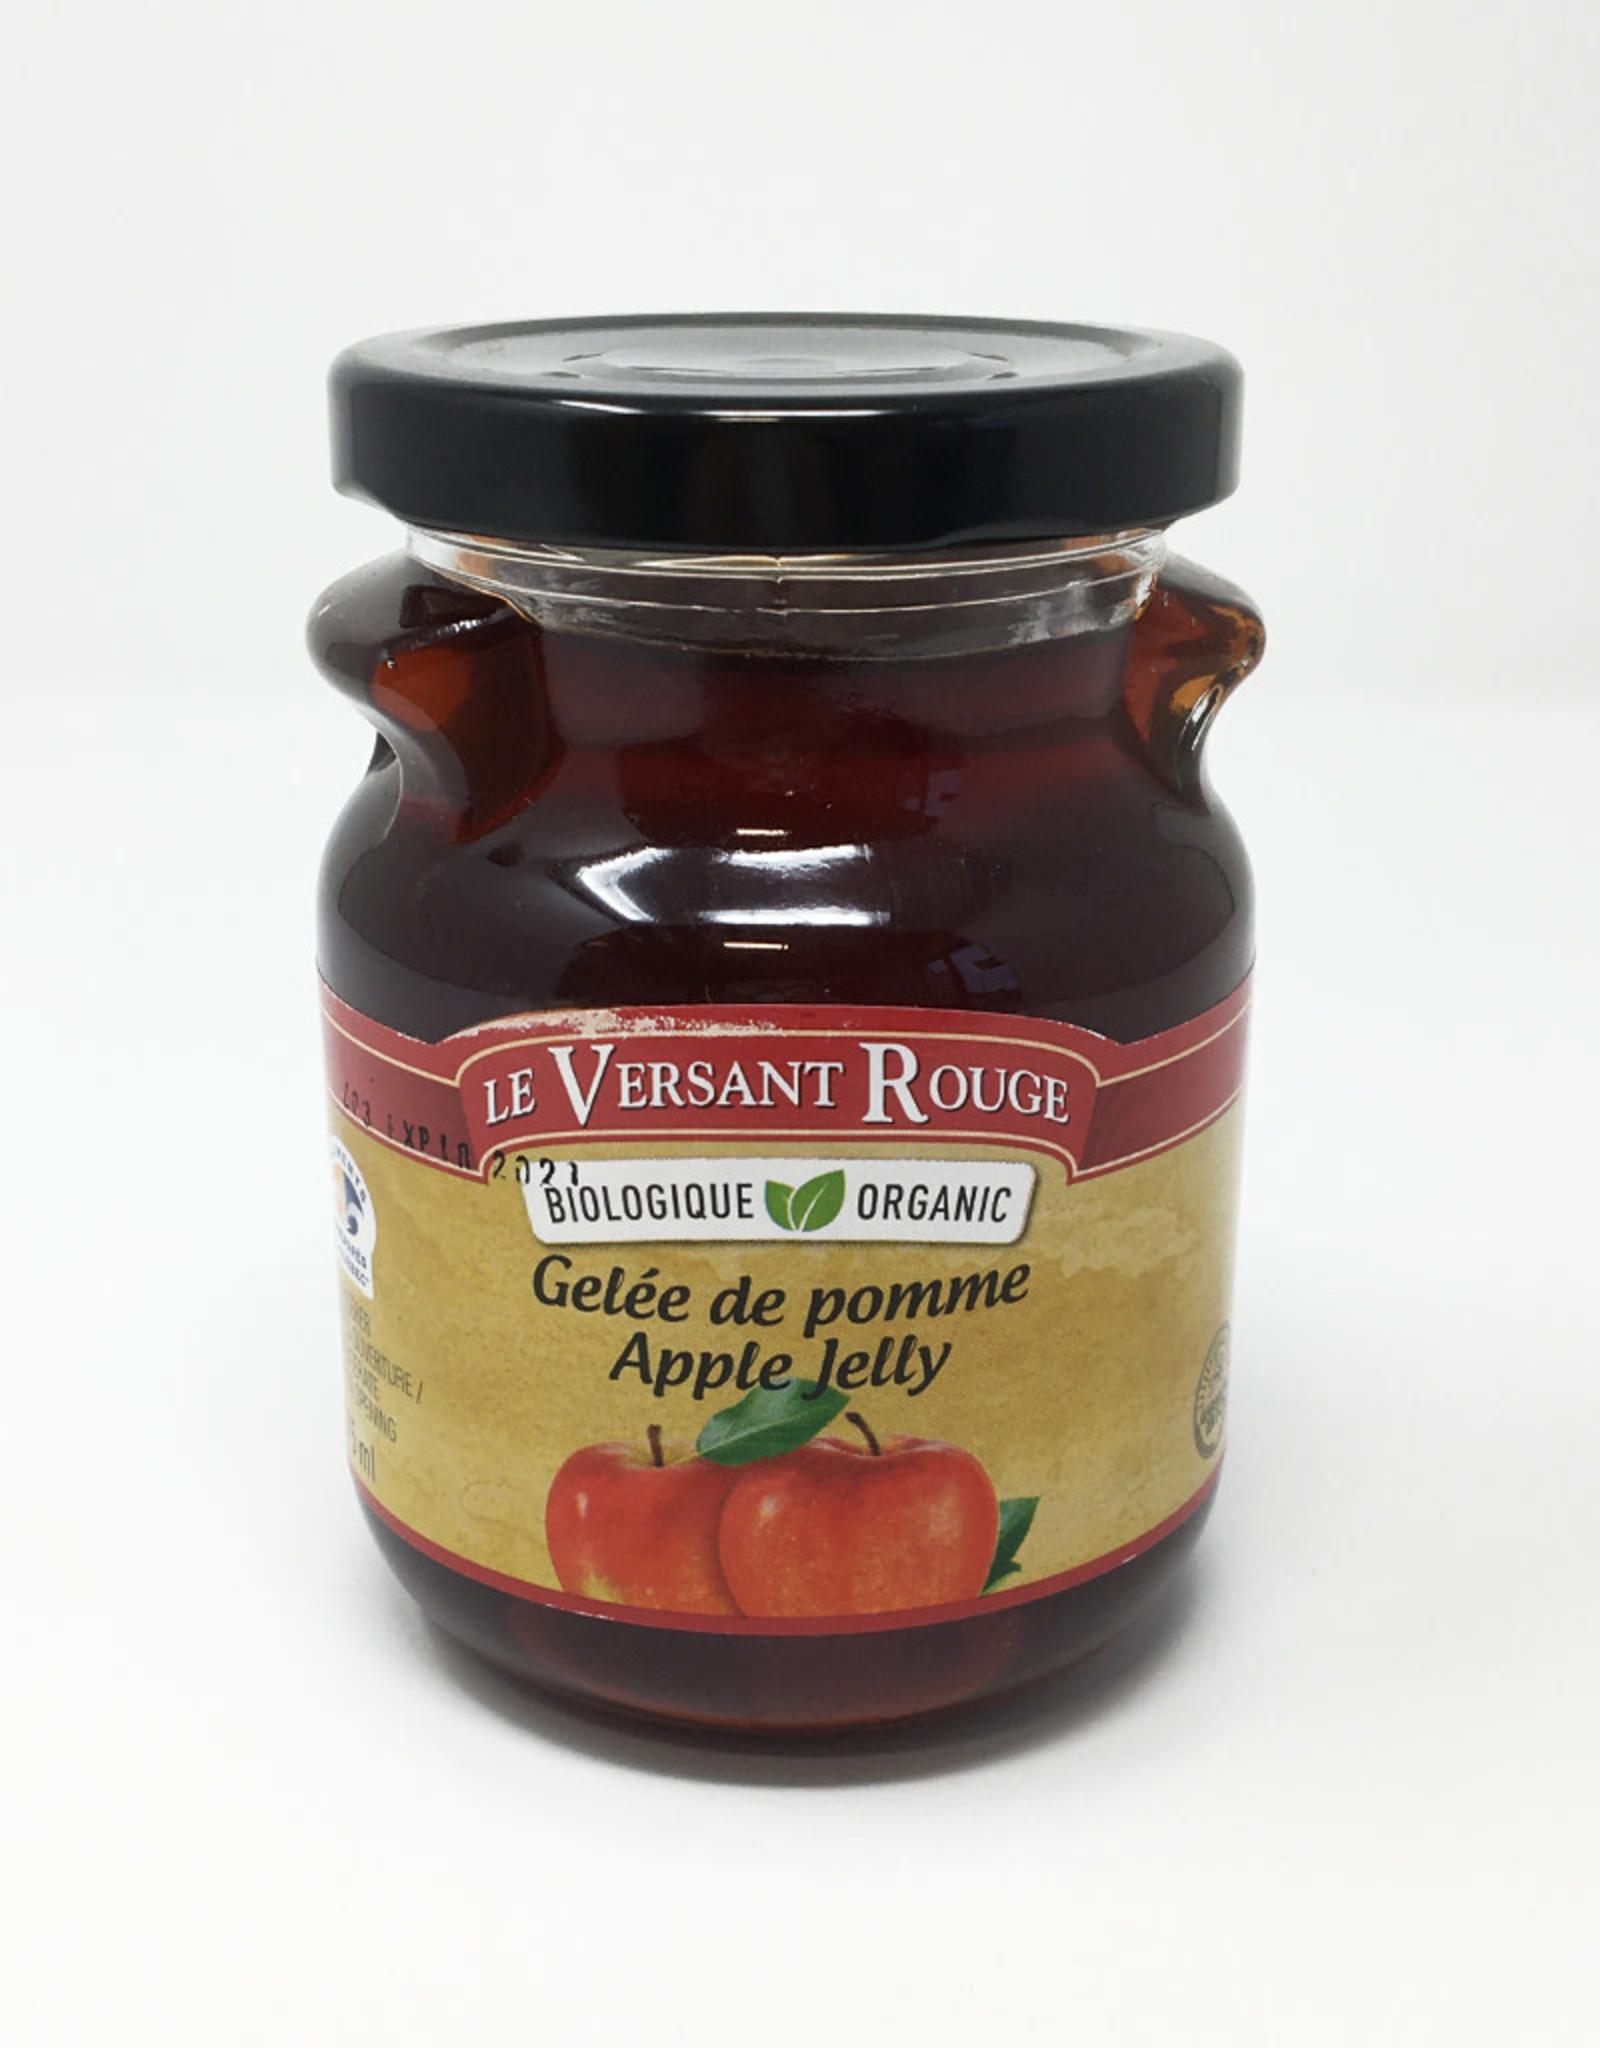 Le Versant Rouge Le Versant Rouge - Organic Jam, Apple Jelly